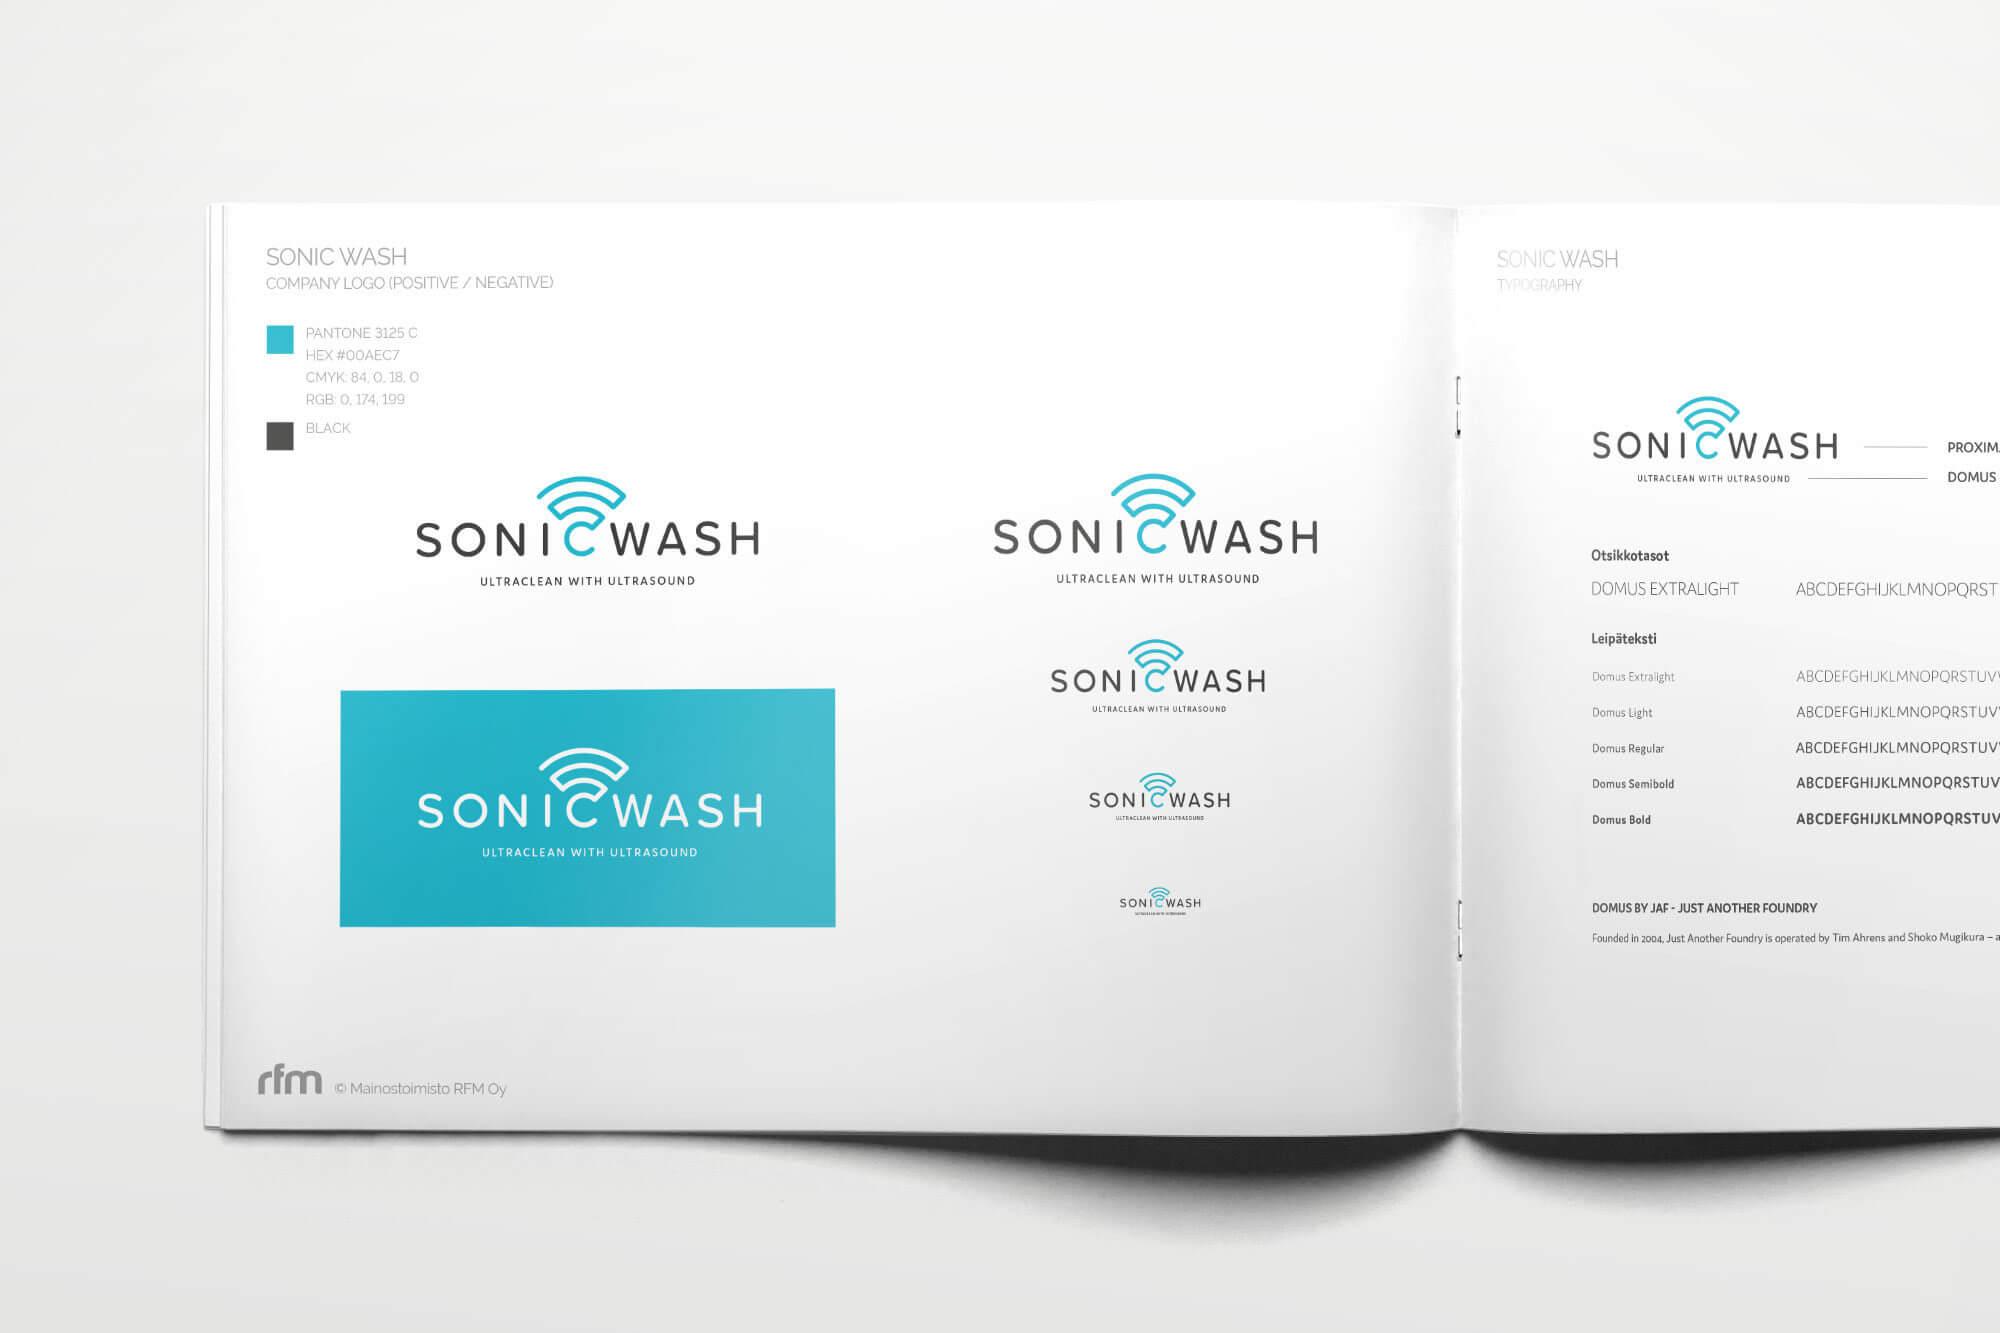 Sonicwash Brandbook